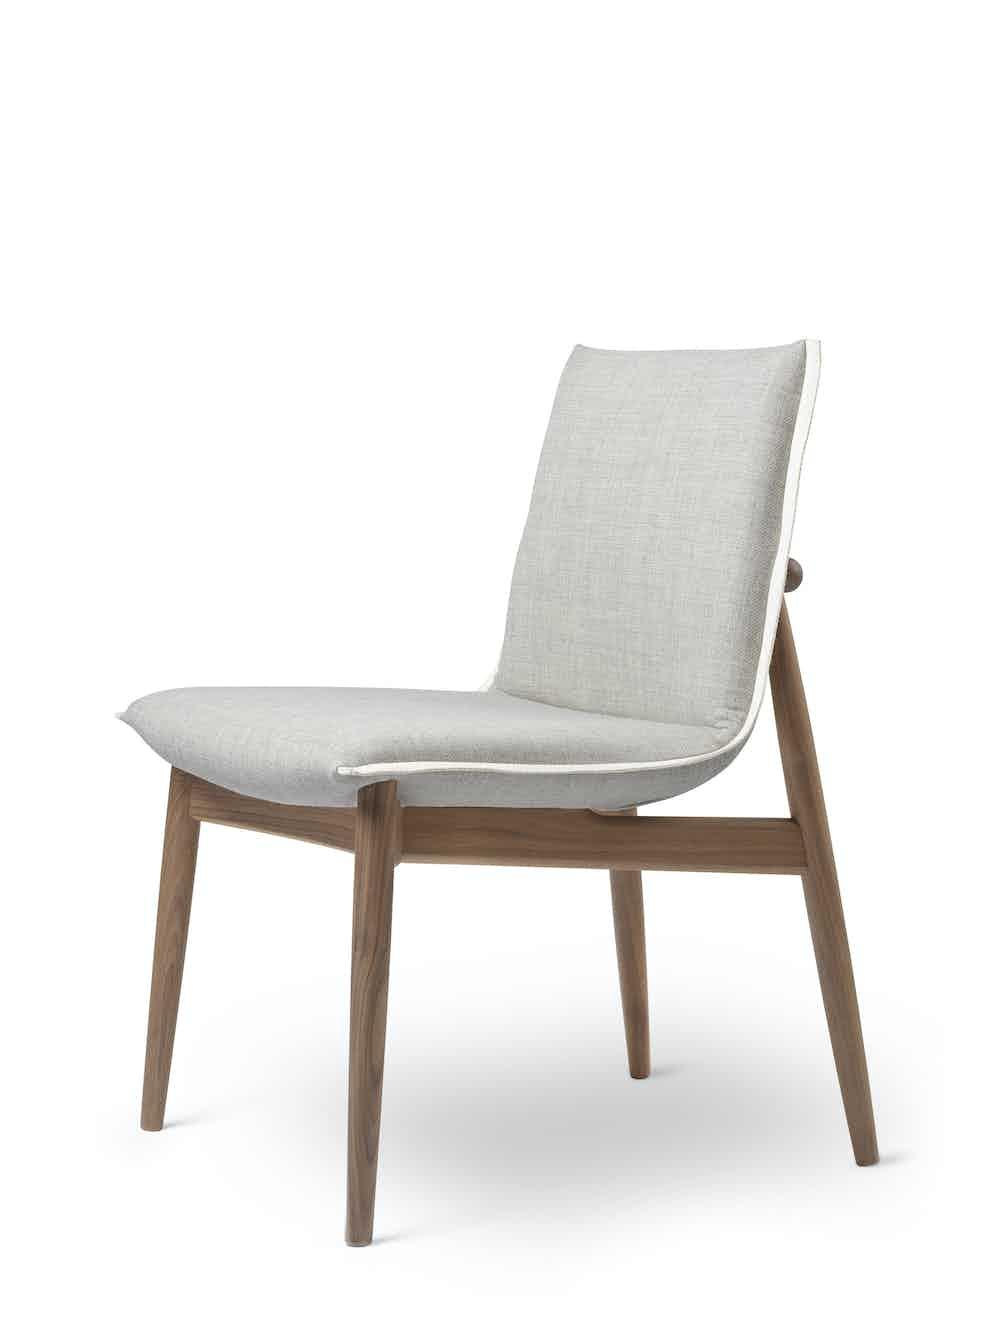 Carl-hansen-and-son-e004-embrace-dining-chair-grey-walnut-haute-living